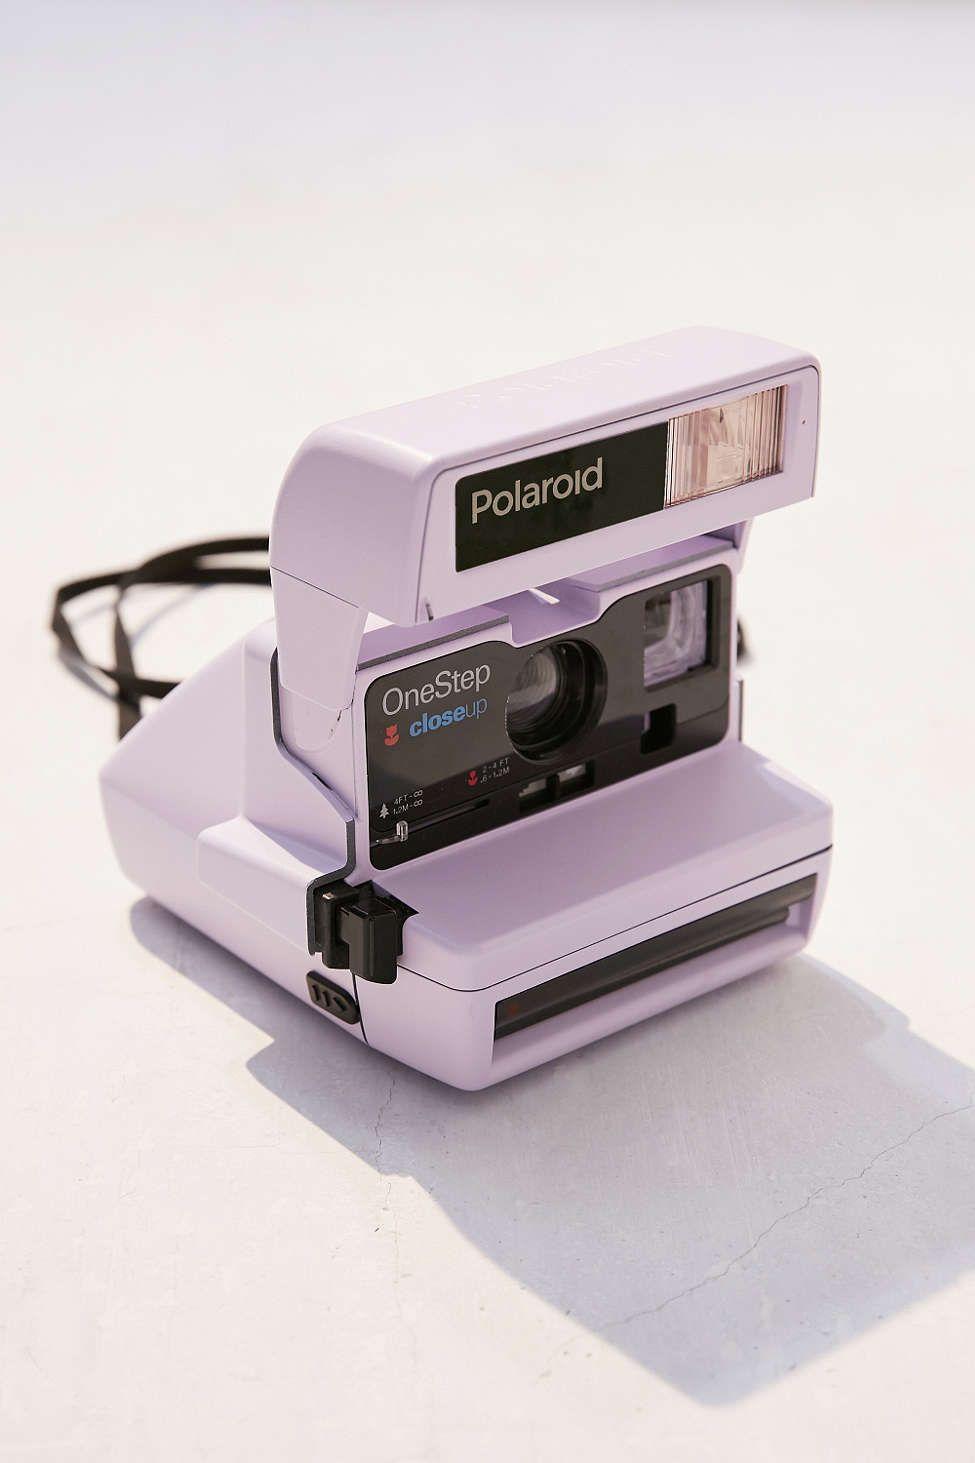 Impossible X UO Lavender Polaroid 600 Close Up Instant Camera